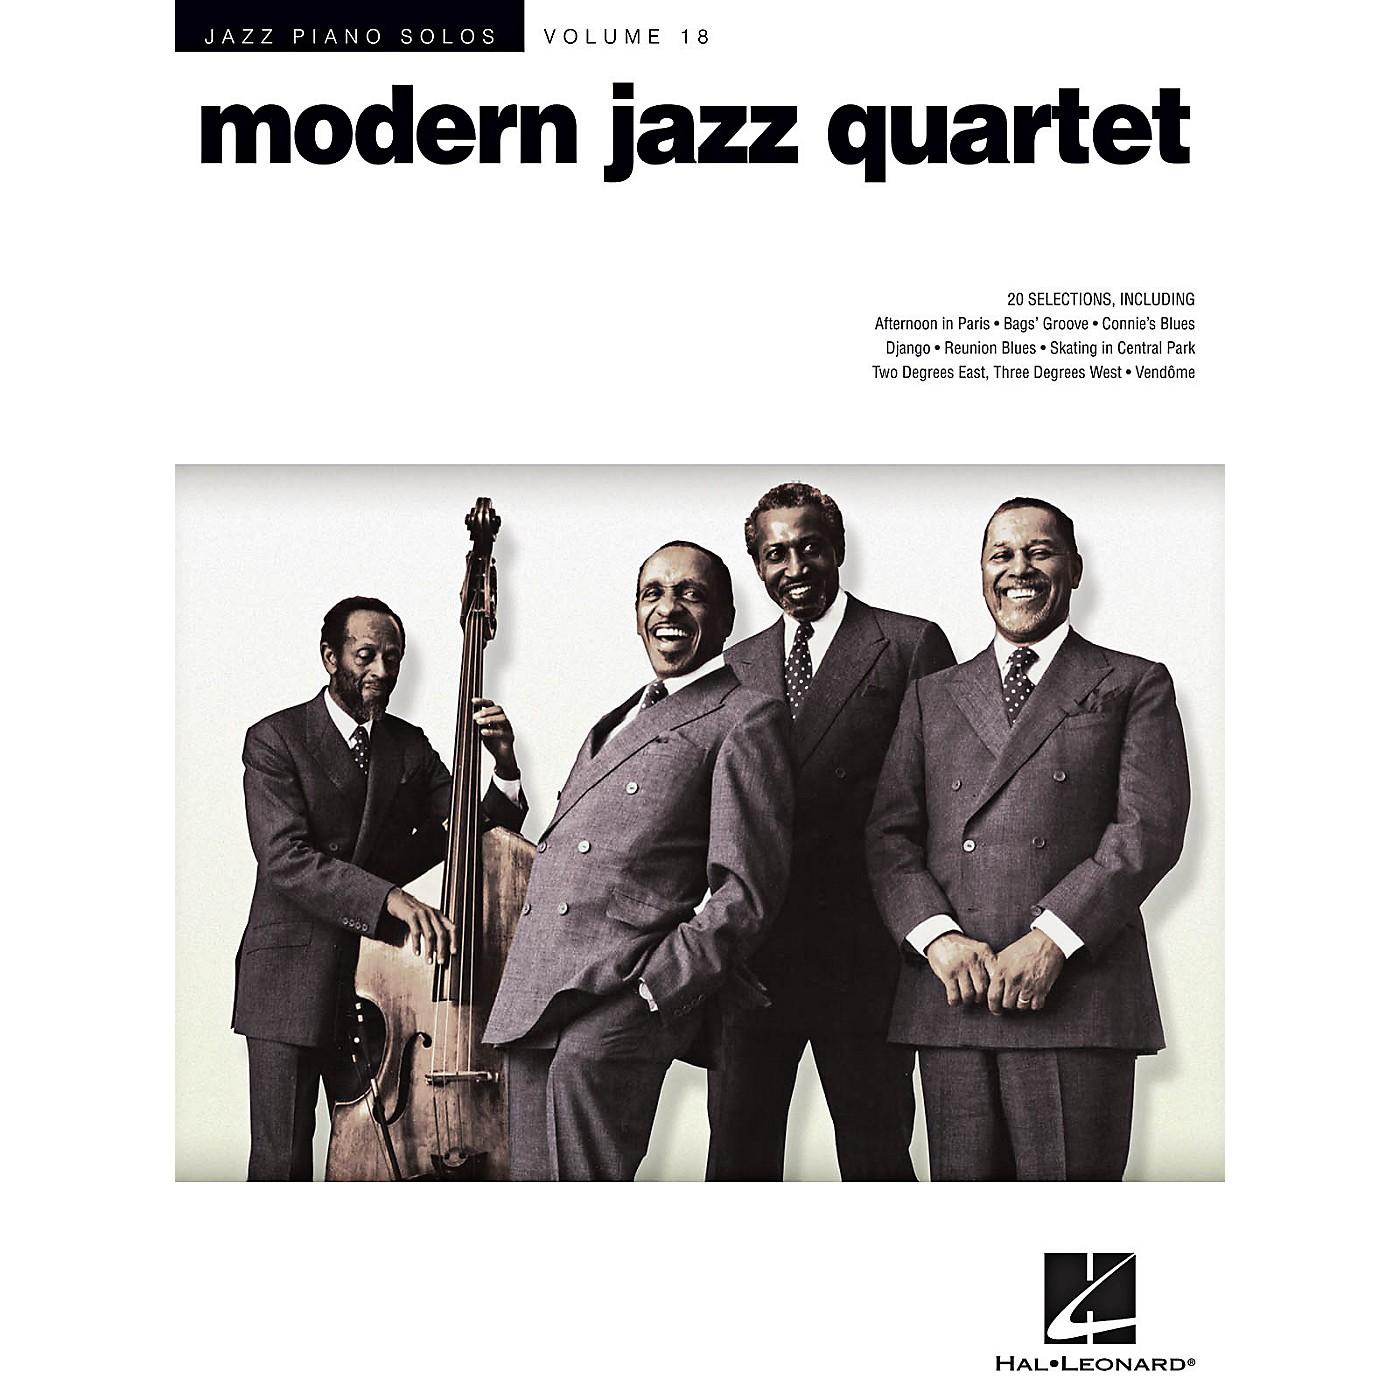 Hal Leonard Modern Jazz Quartet - Jazz Piano Solos Series Volume 18 thumbnail